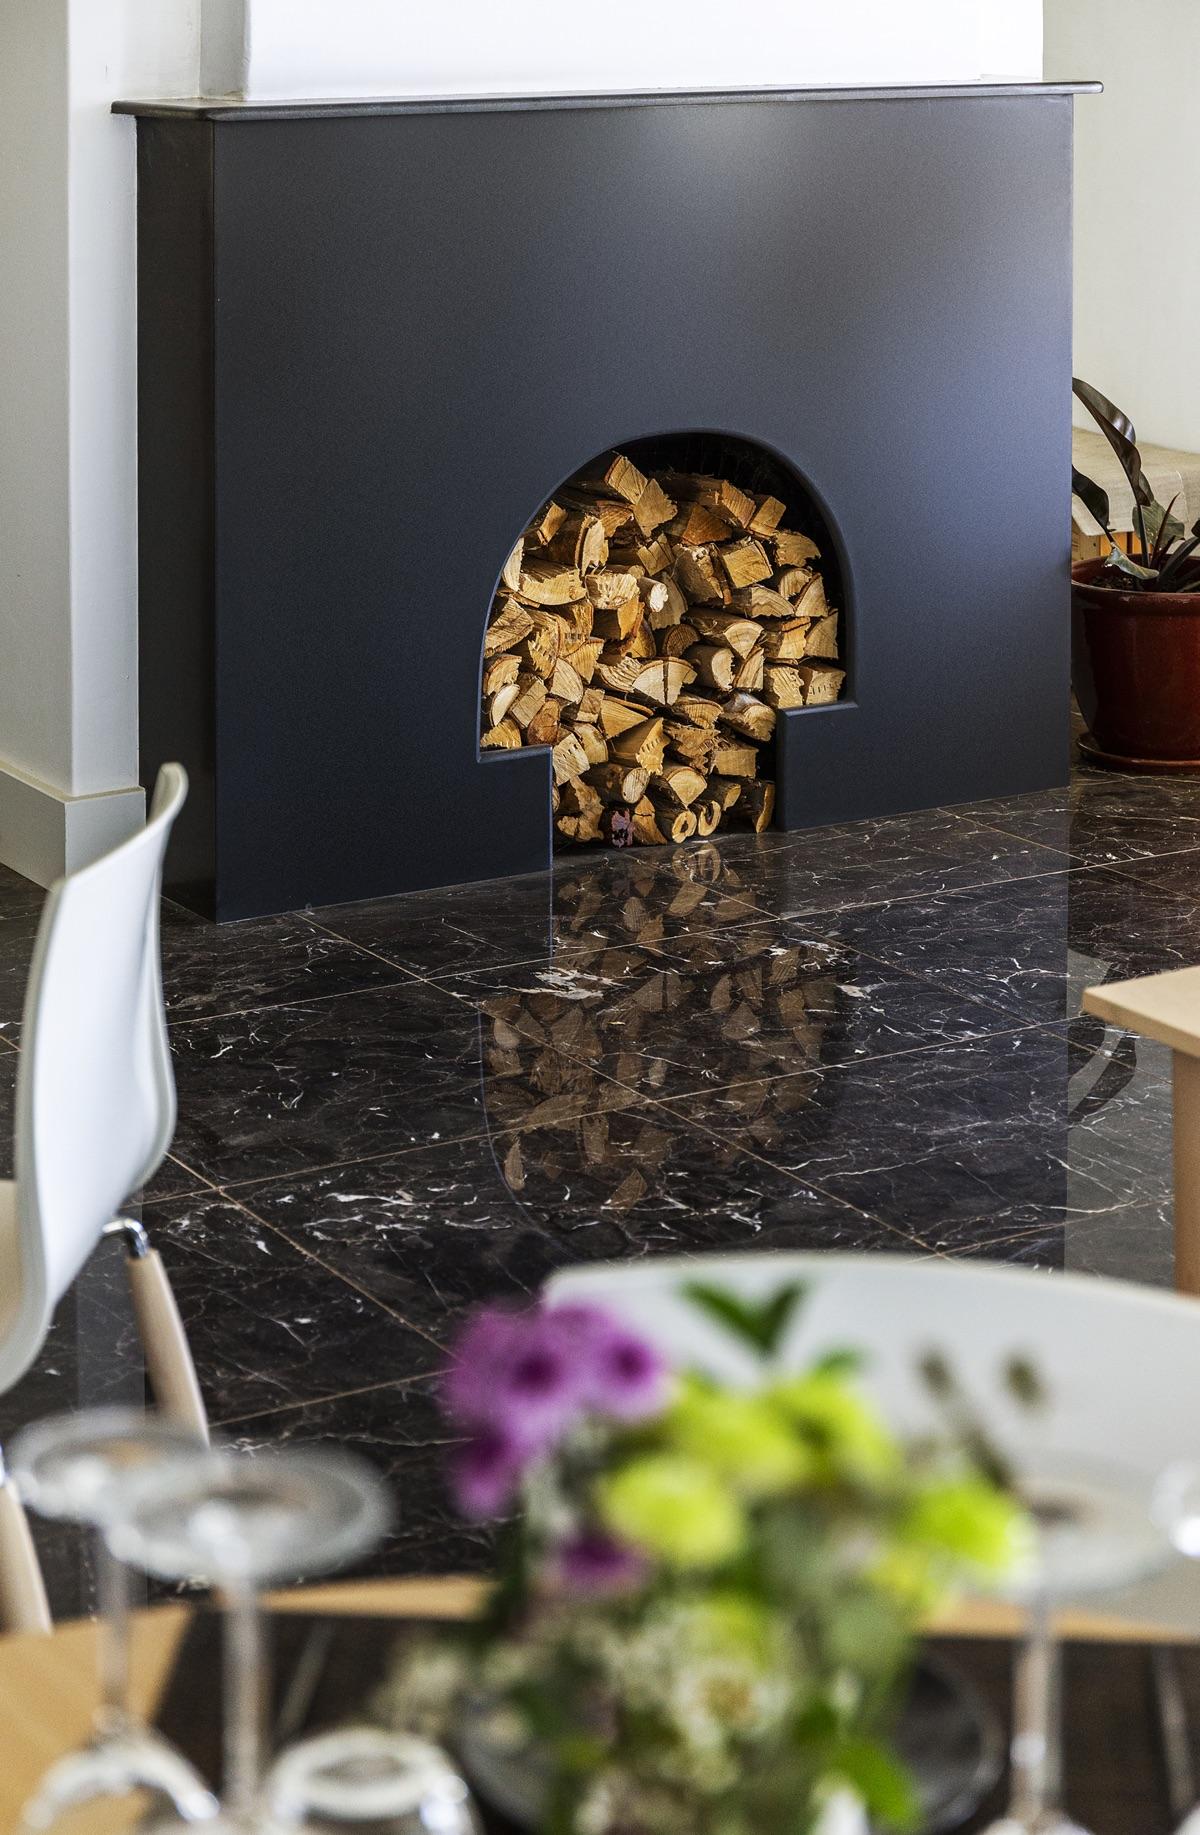 Artmar-MARBLE-TILES_COMMERCIAL-PROJECTS_Kanu-Wine-Farm_Emprador-Dark-Marble-Tiles_Polished-Finish_Supply-1.jpg